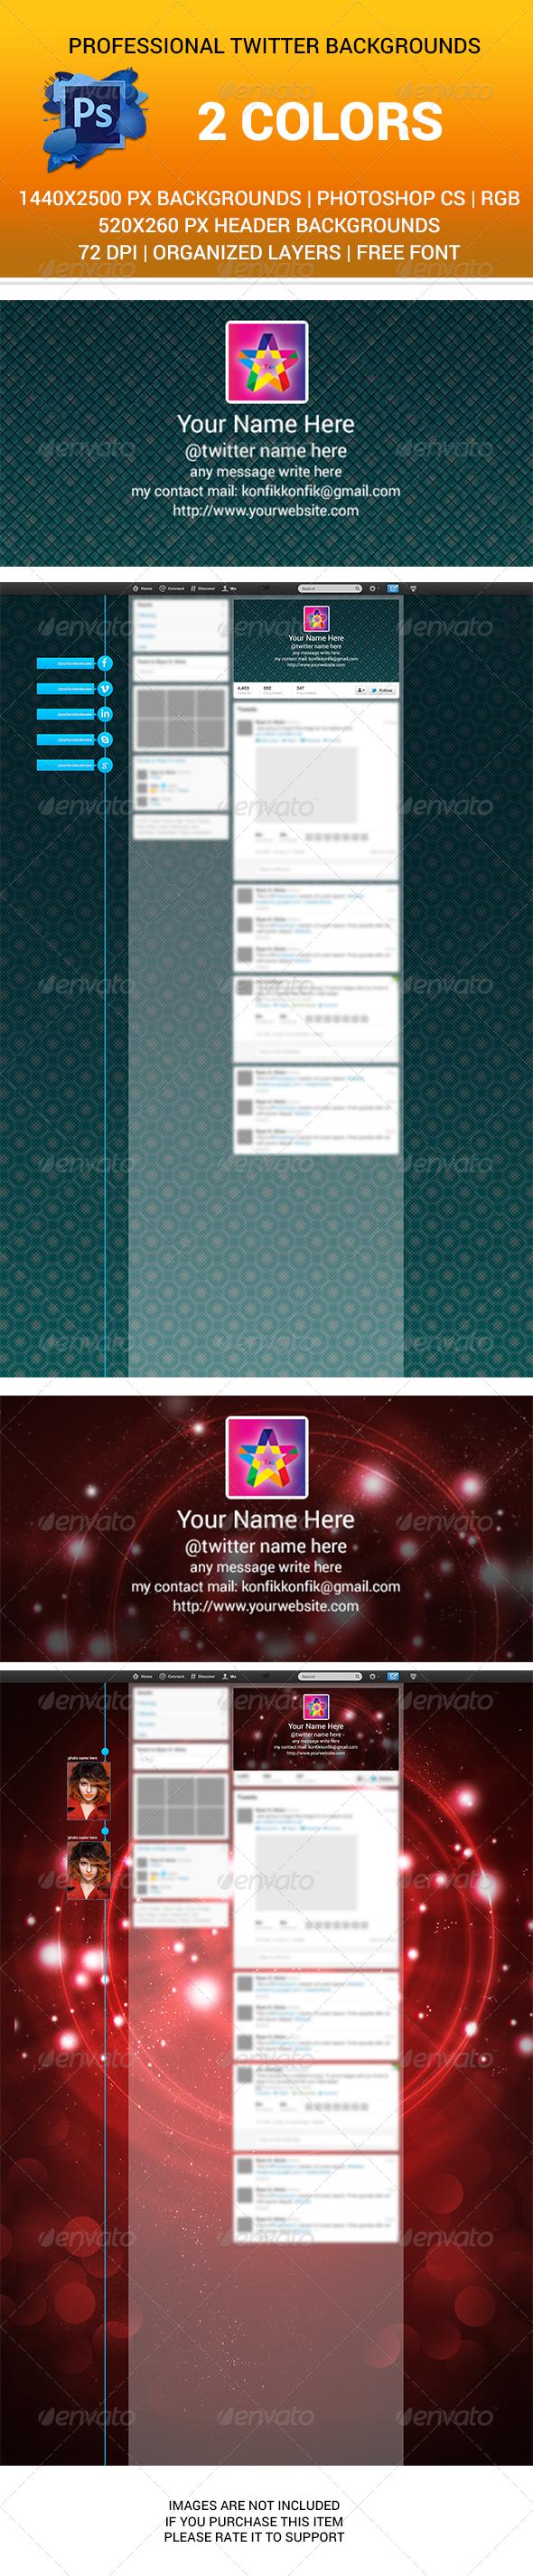 Twitter Backgrounds and Title bg PSD New Design - Twitter Social Media